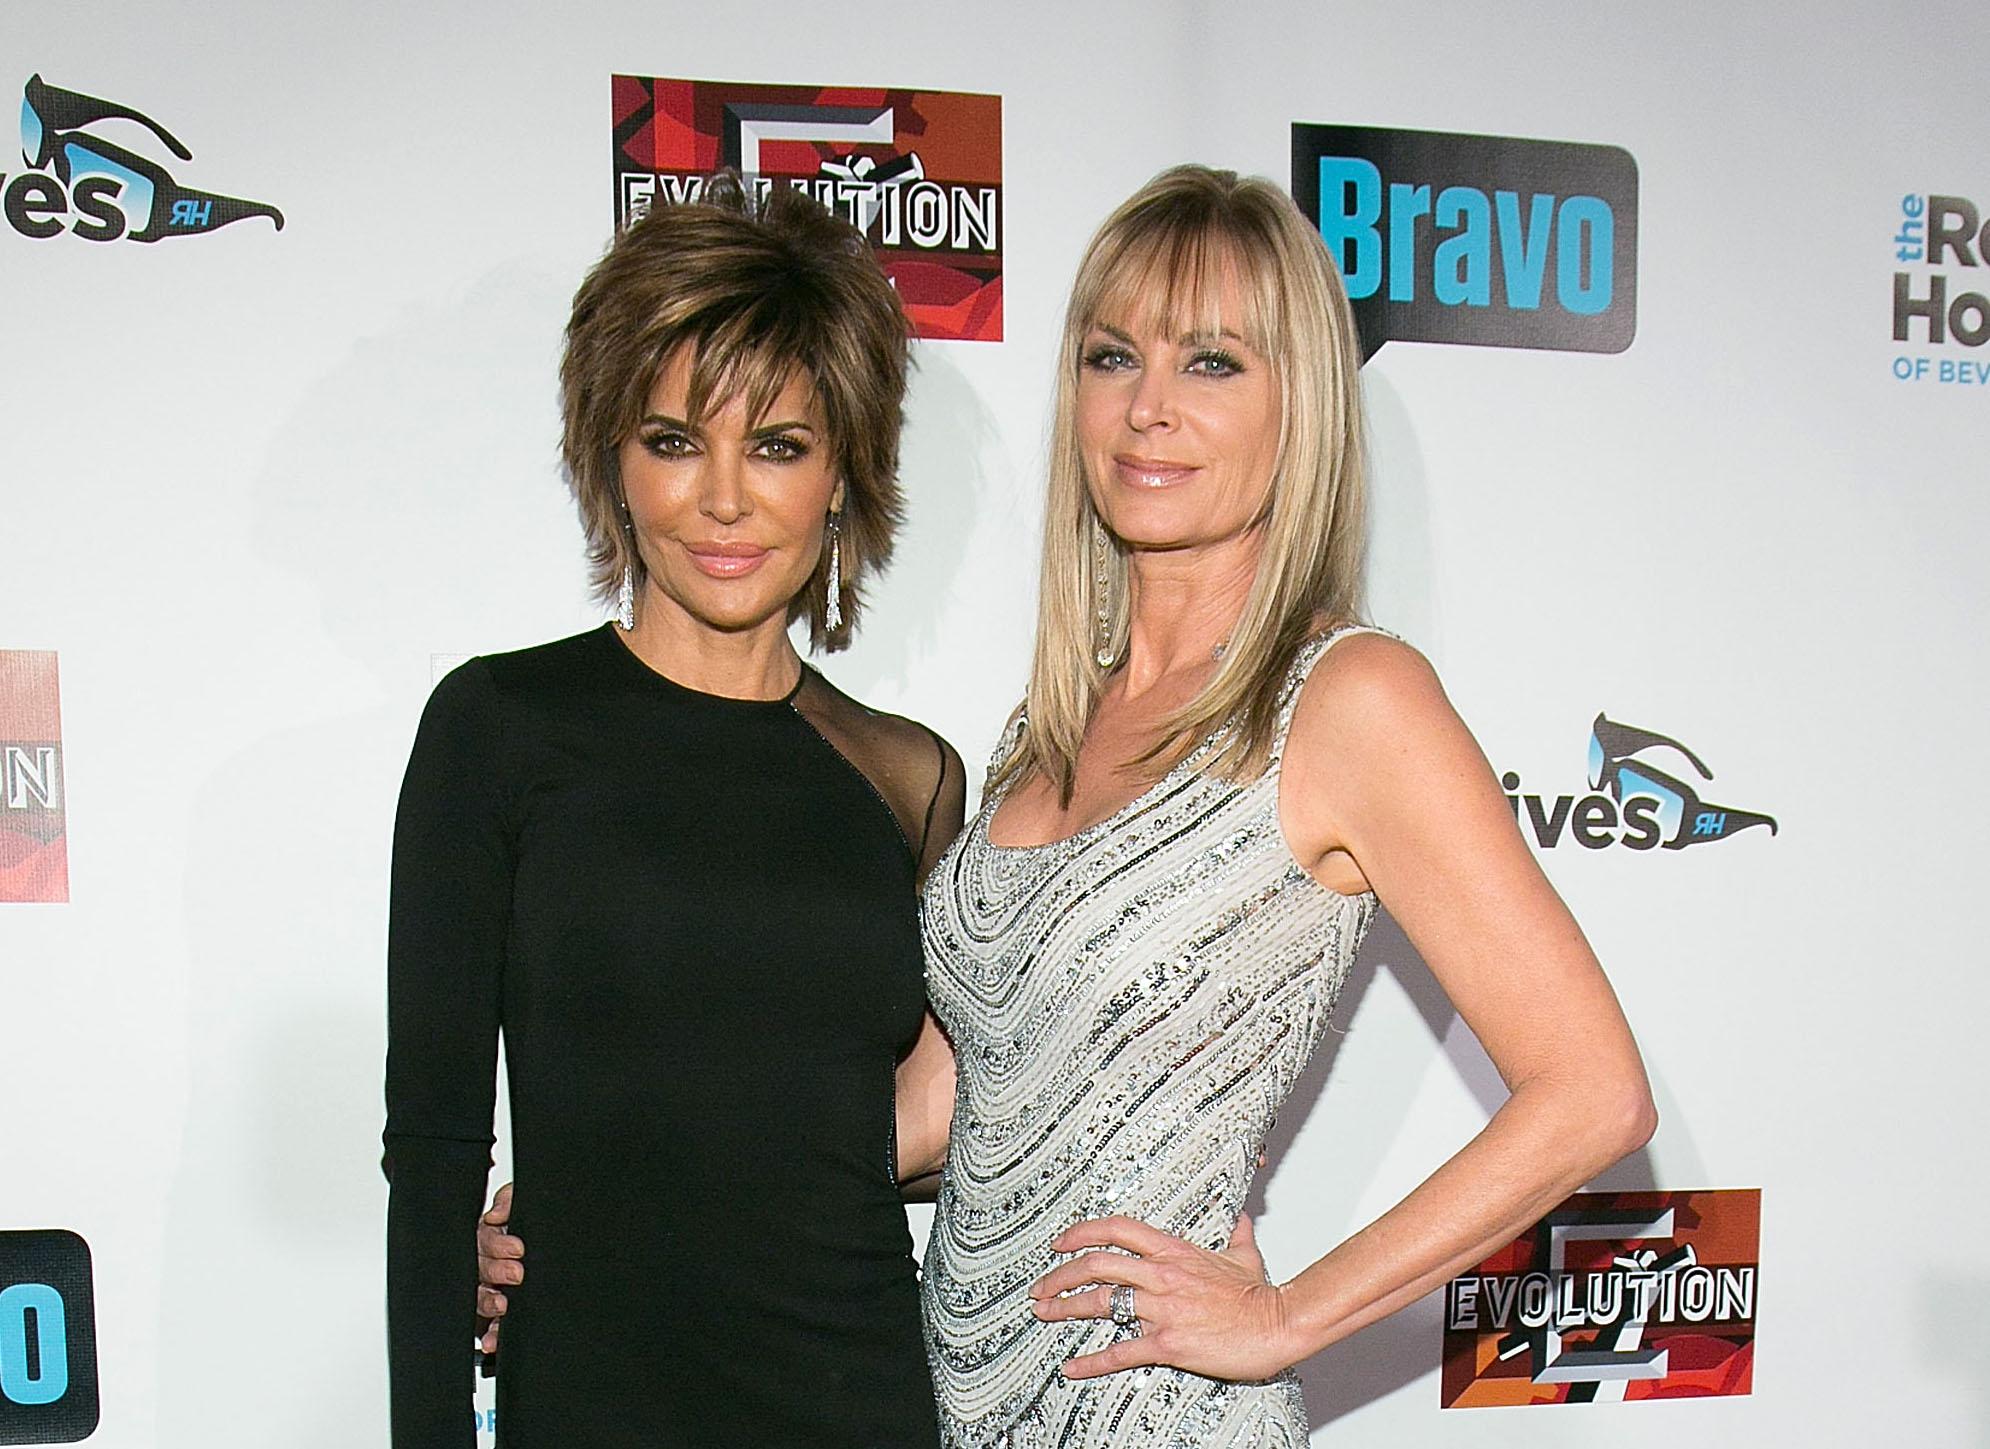 Lisa Rinna & Eileen Davidson - FilmMagic